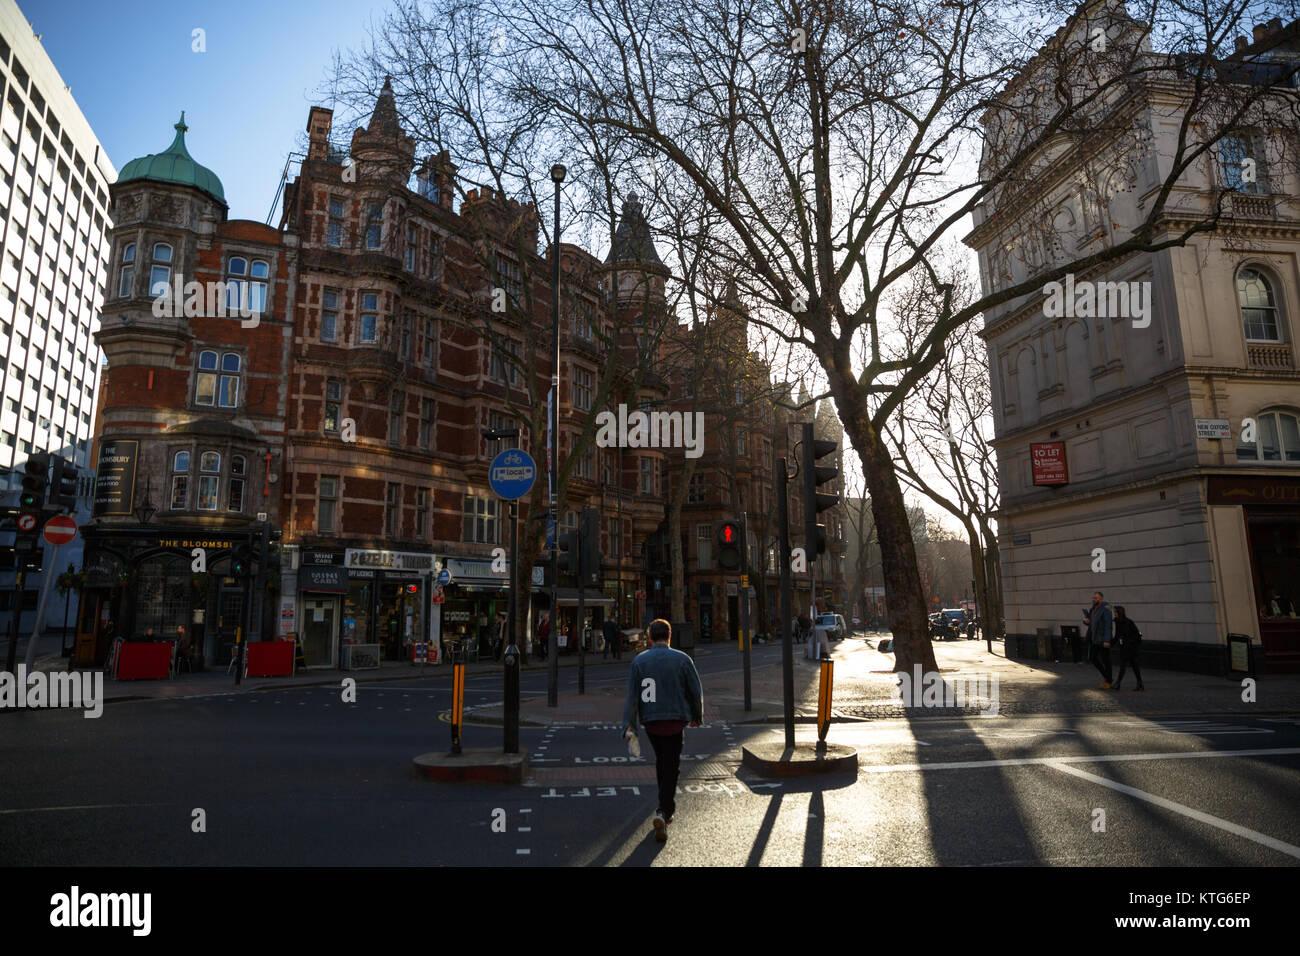 People walking outside on sidewalk during sunset in Bloomsbury - London, England, UK - Stock Image